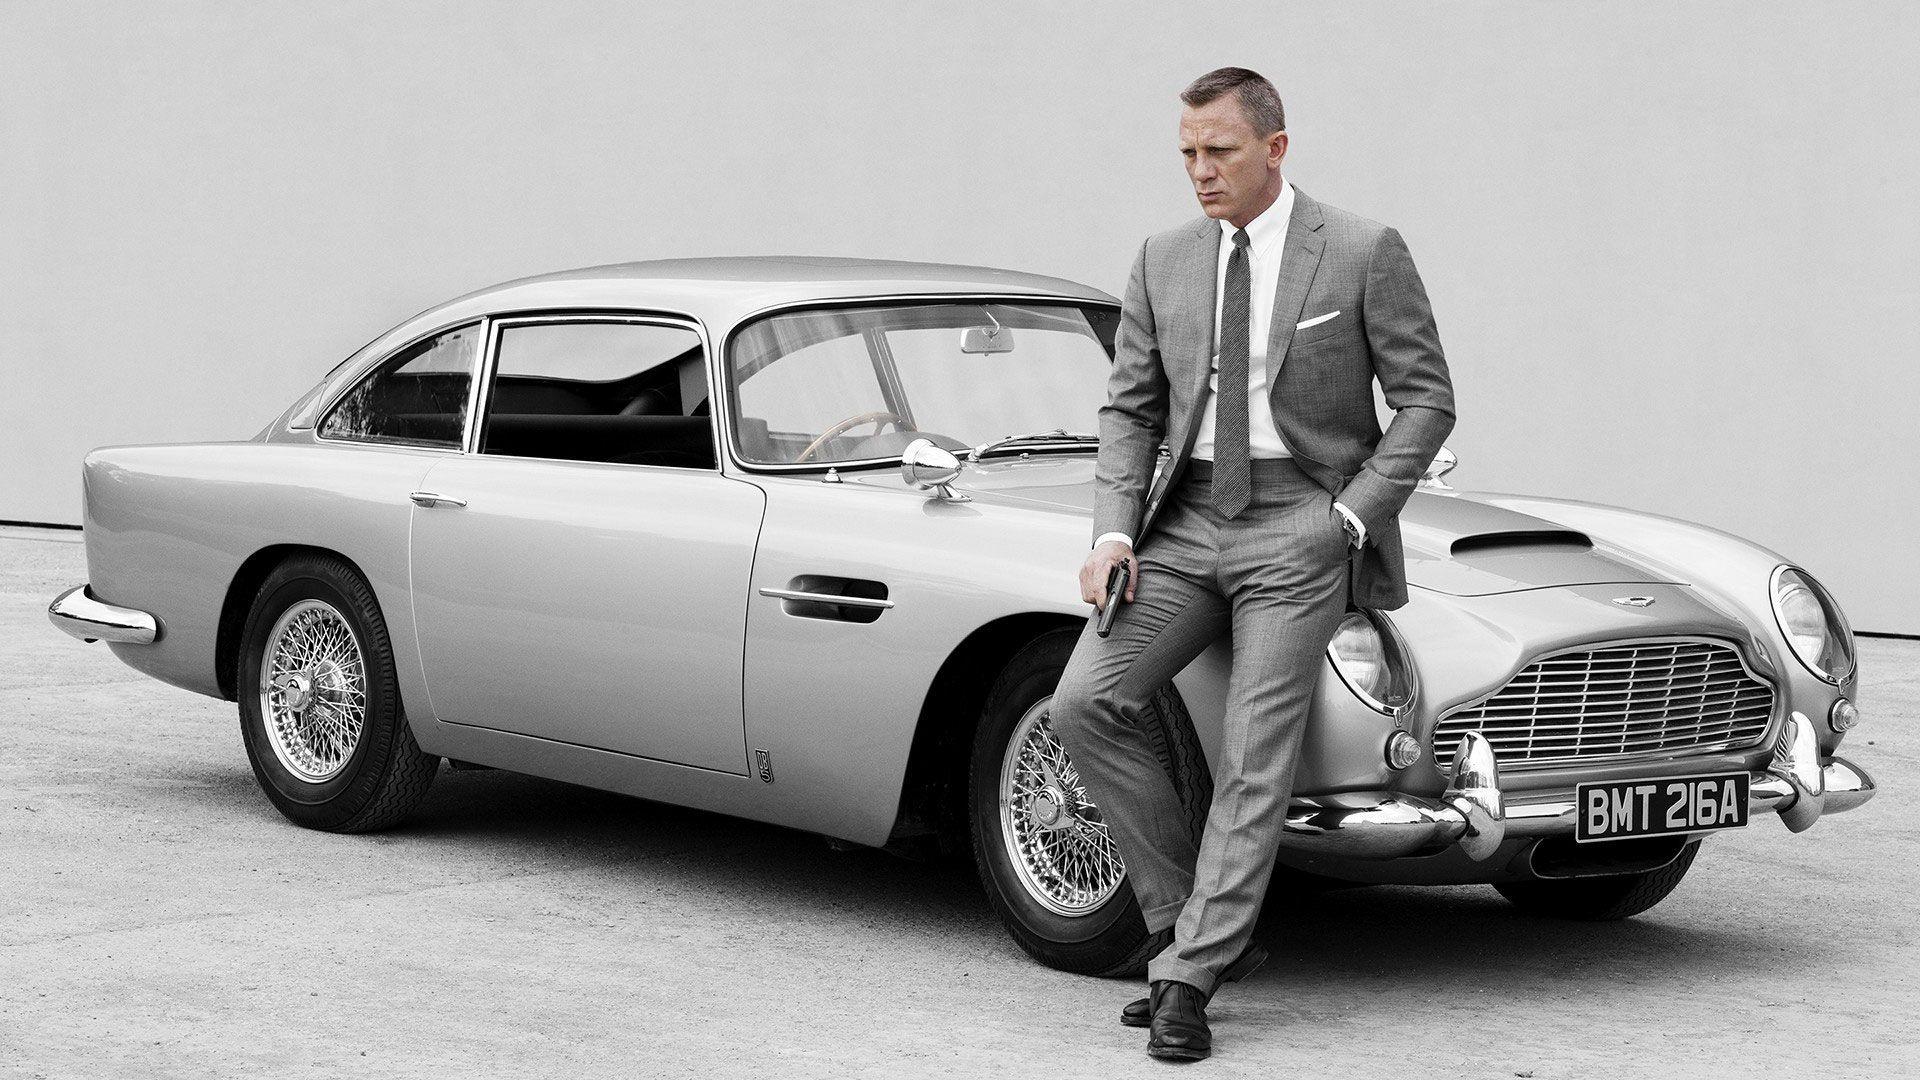 James Bond Cool Hd Wallpapers James Bond Cars Bond Cars James Bond Suit